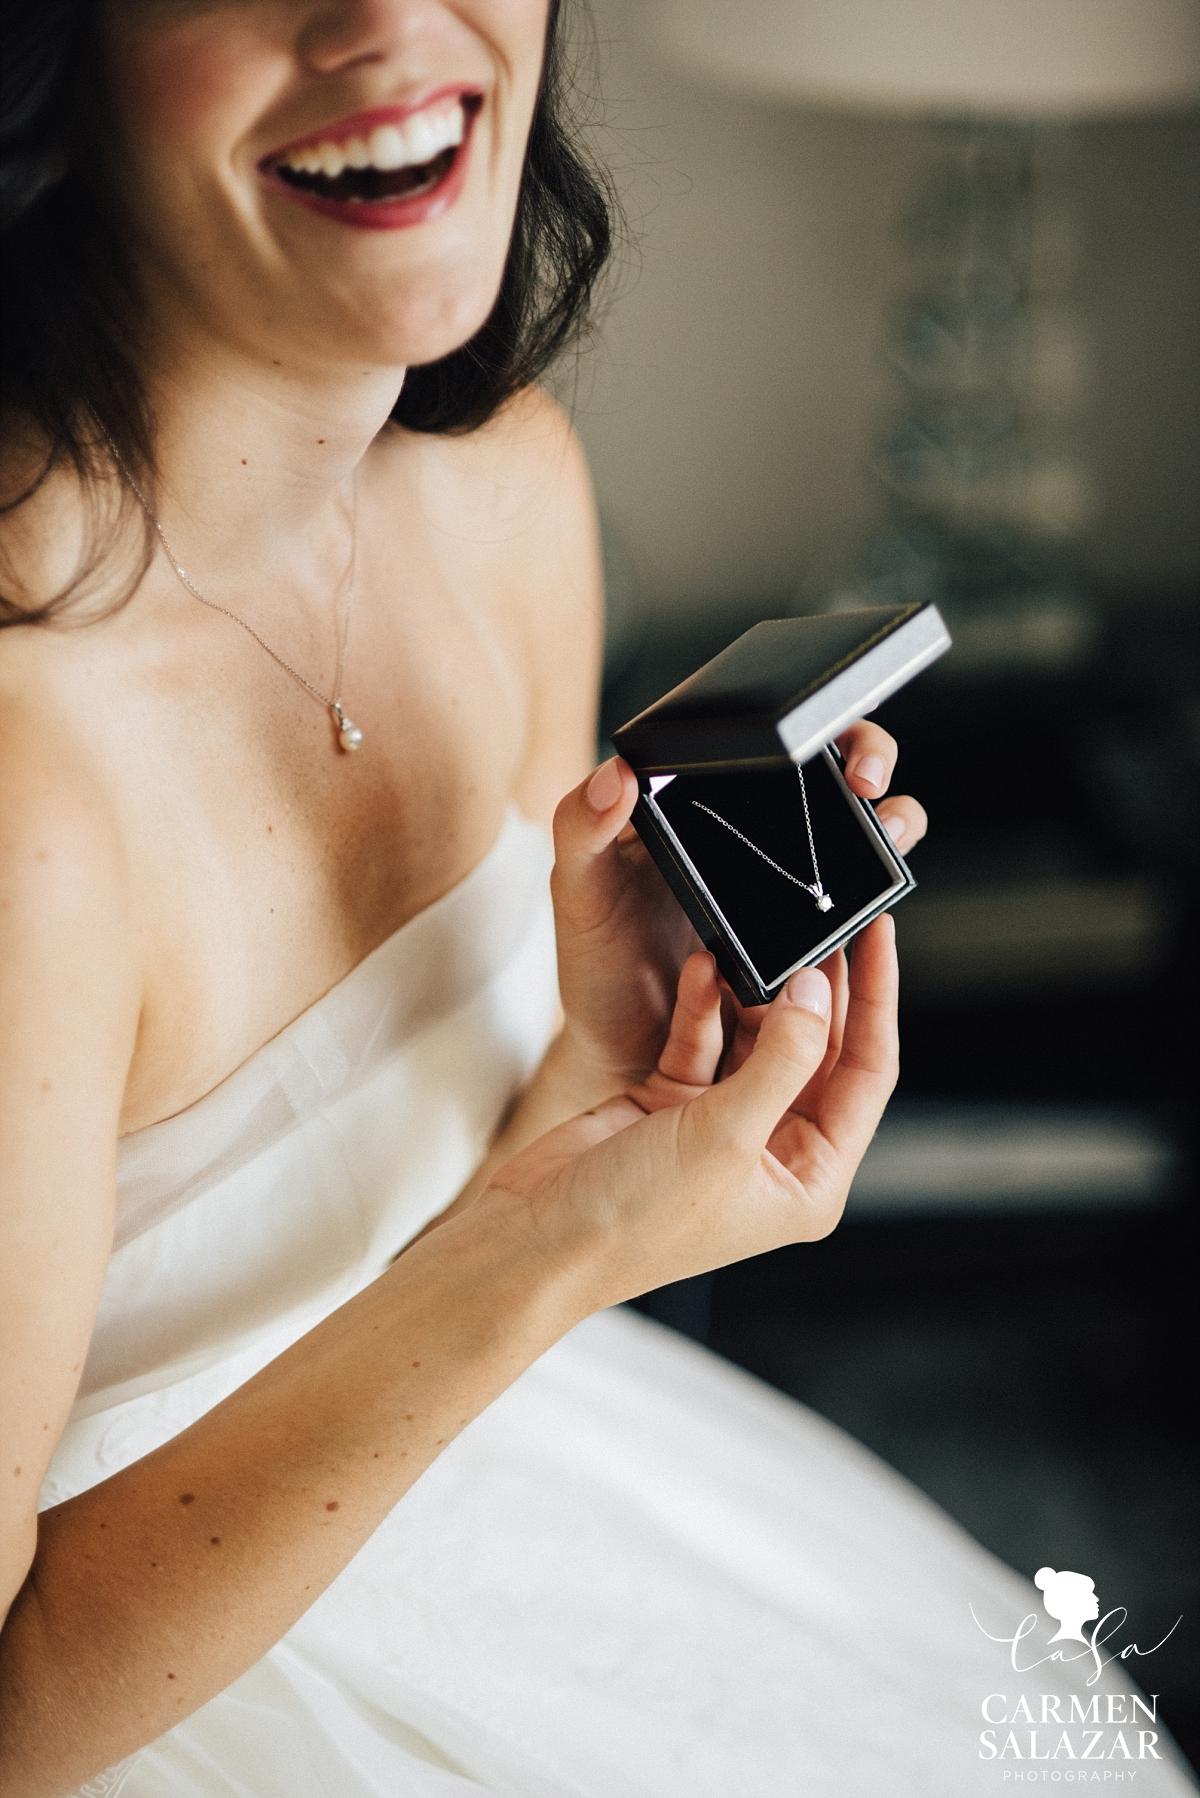 Romantic wedding day surprise gift - Carmen Salazar